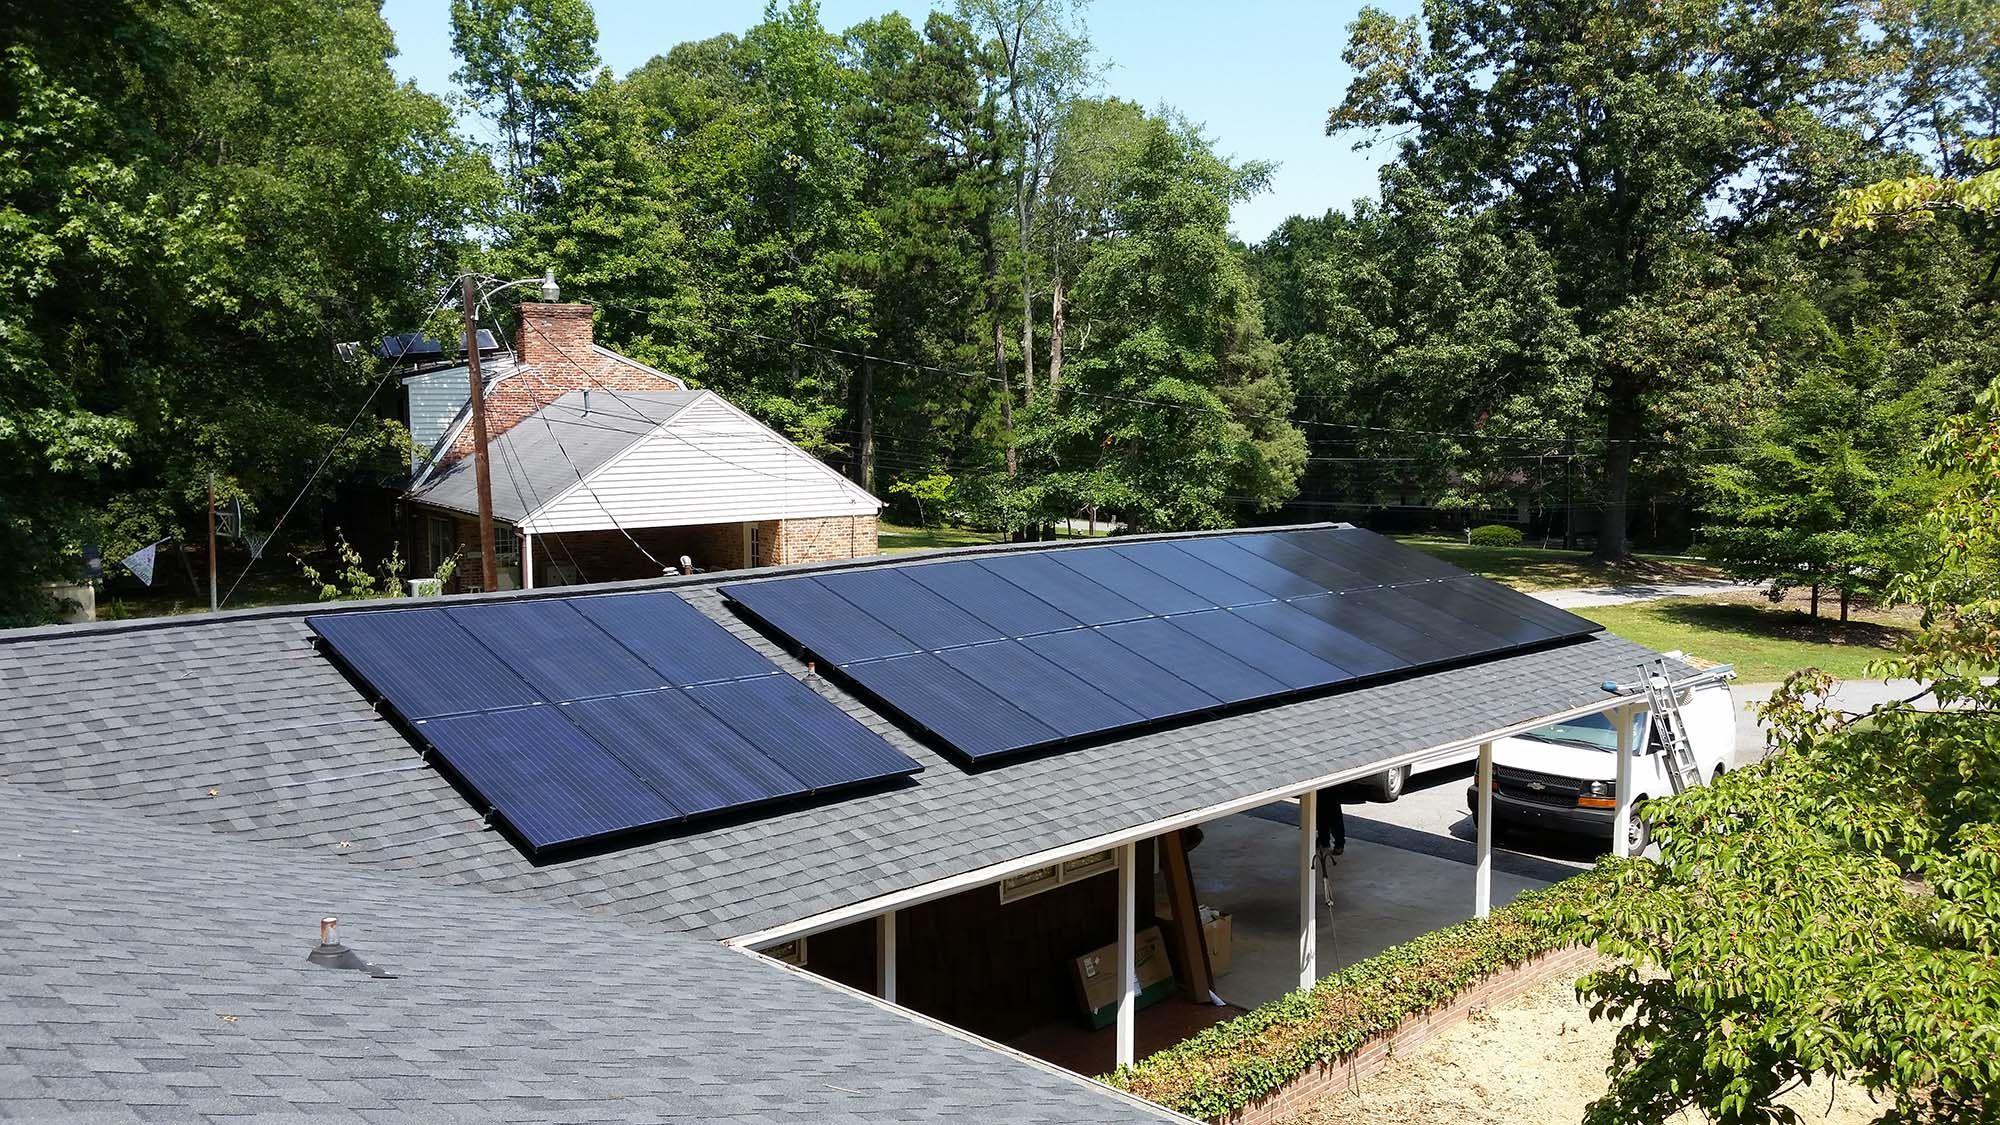 We Installed 26 275 Watt Black On Black Suniva Solar Panels On This Carport In Highpoint Nc Making A 7 15 Solar Array Solar Panels Roof Solar Panel Solar